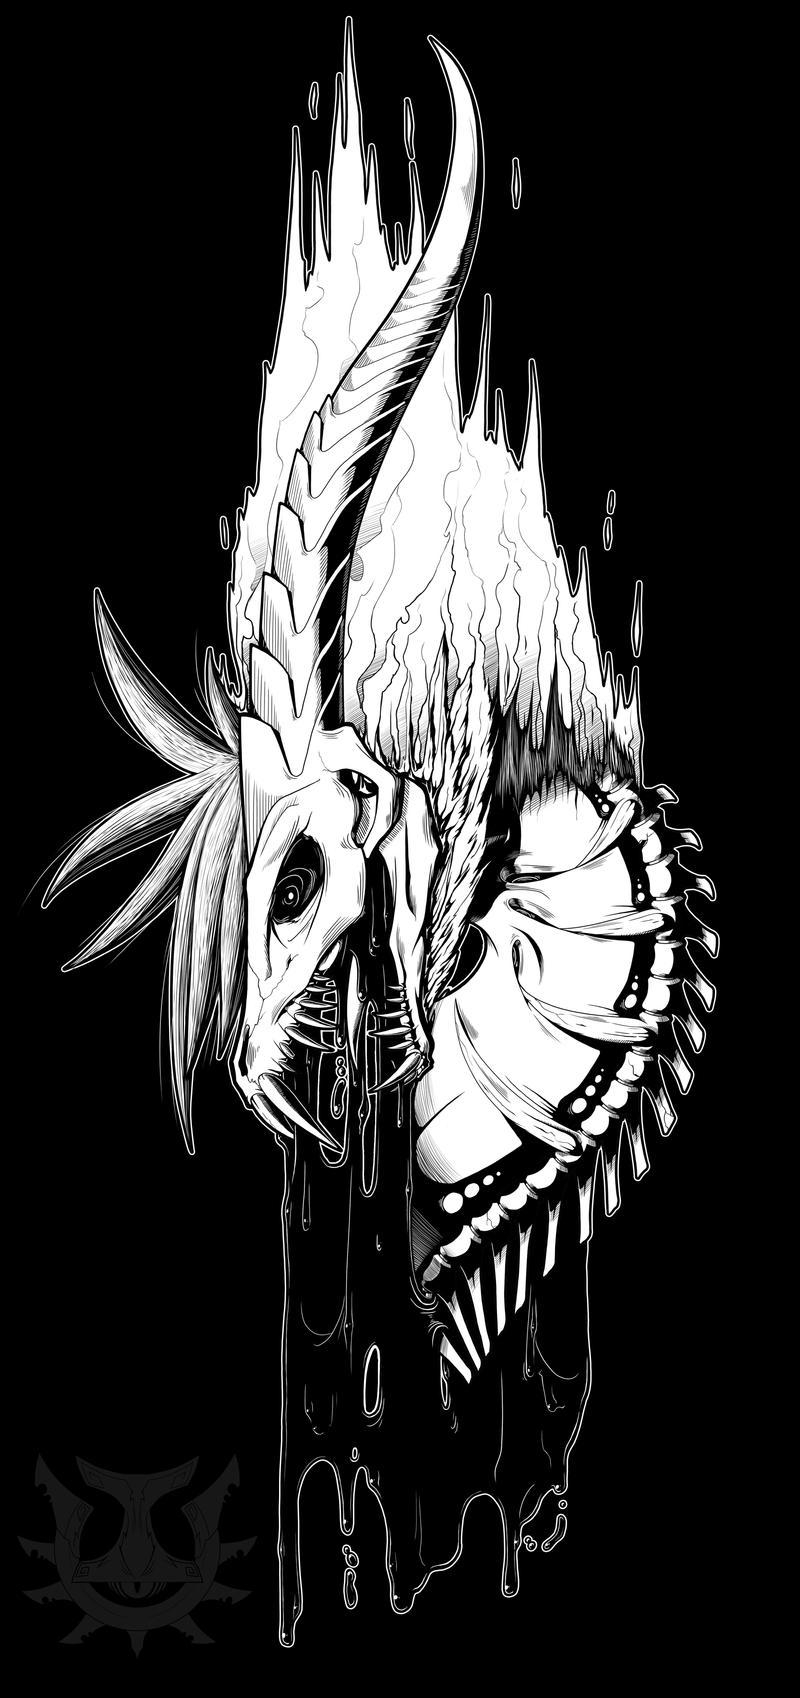 Black and White: Rage Demon by Genesisnx